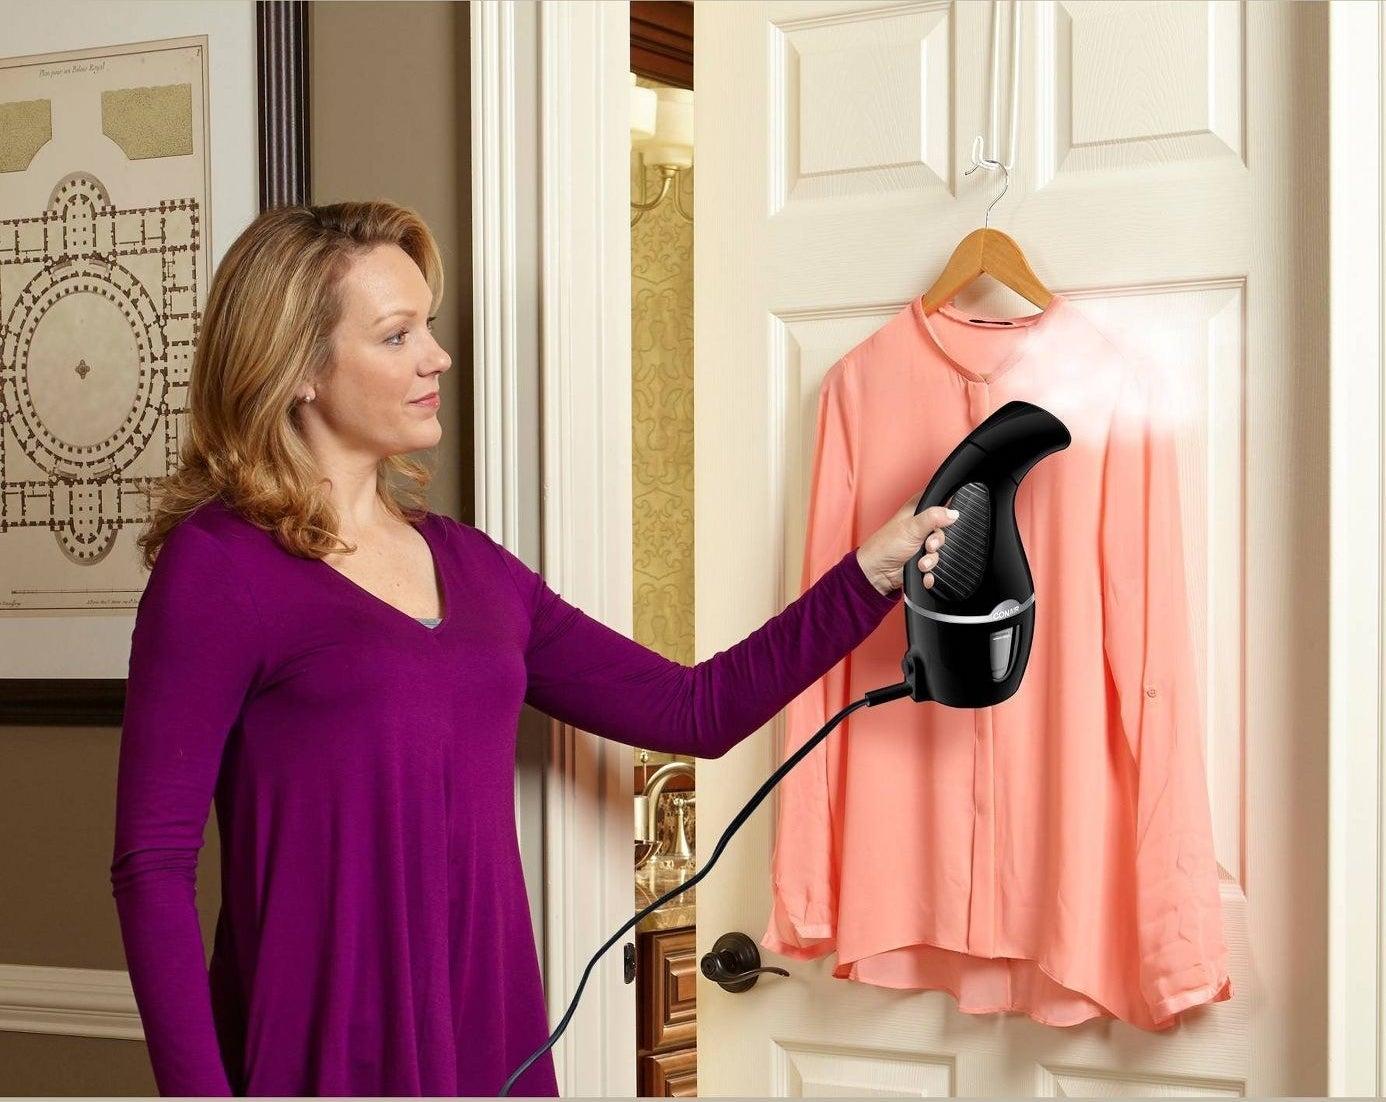 Model using black steamer on coral shirt